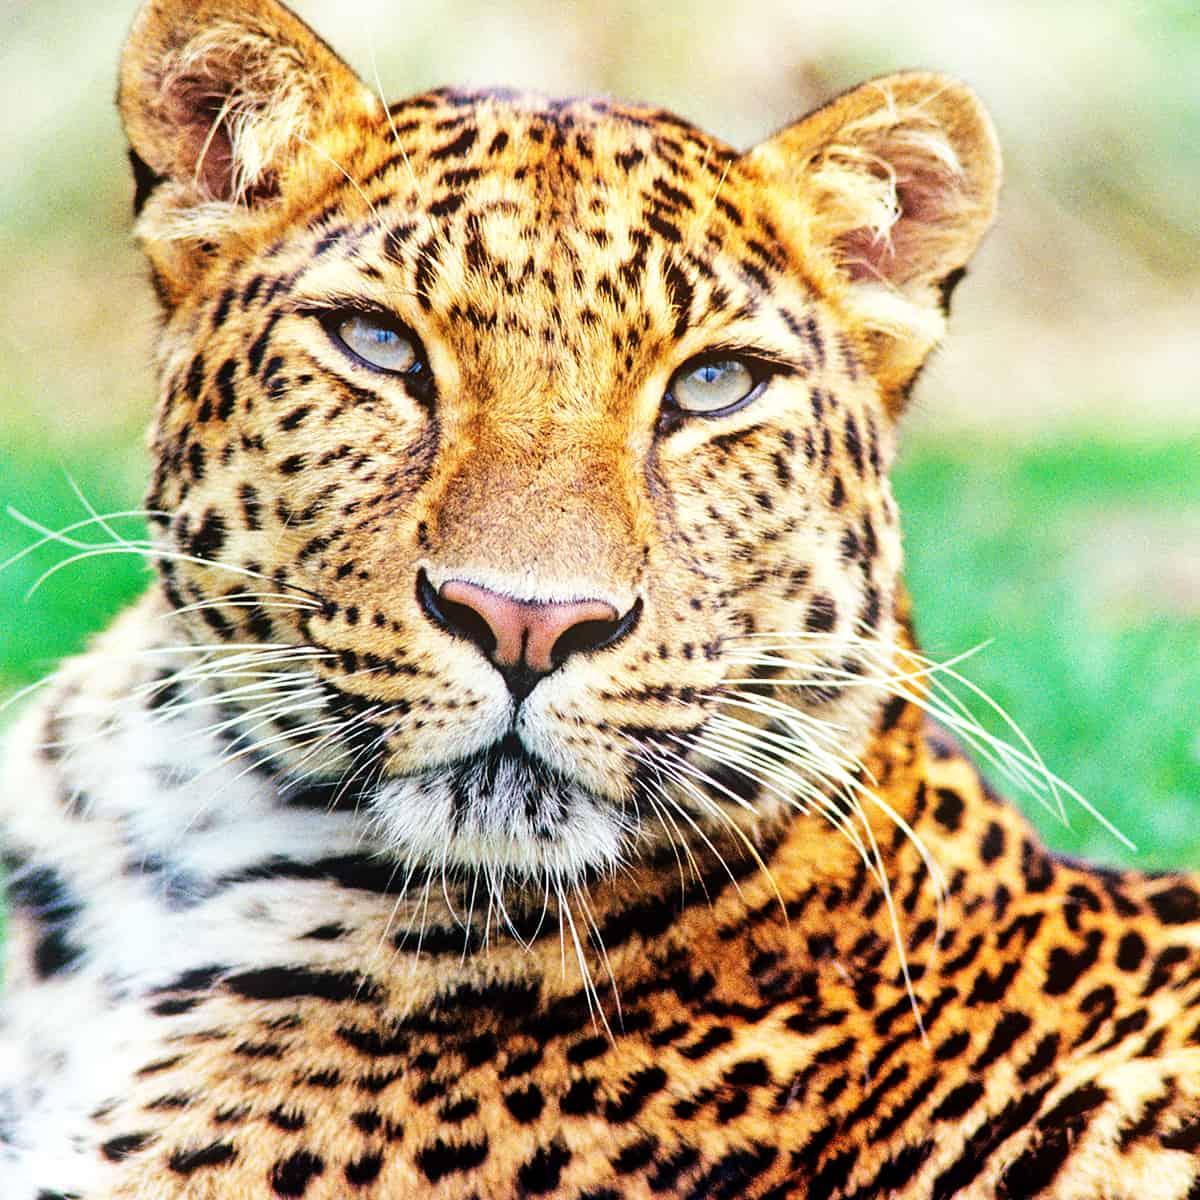 37final_wwf-at_Amur-Leopard_Nahaufnahme_